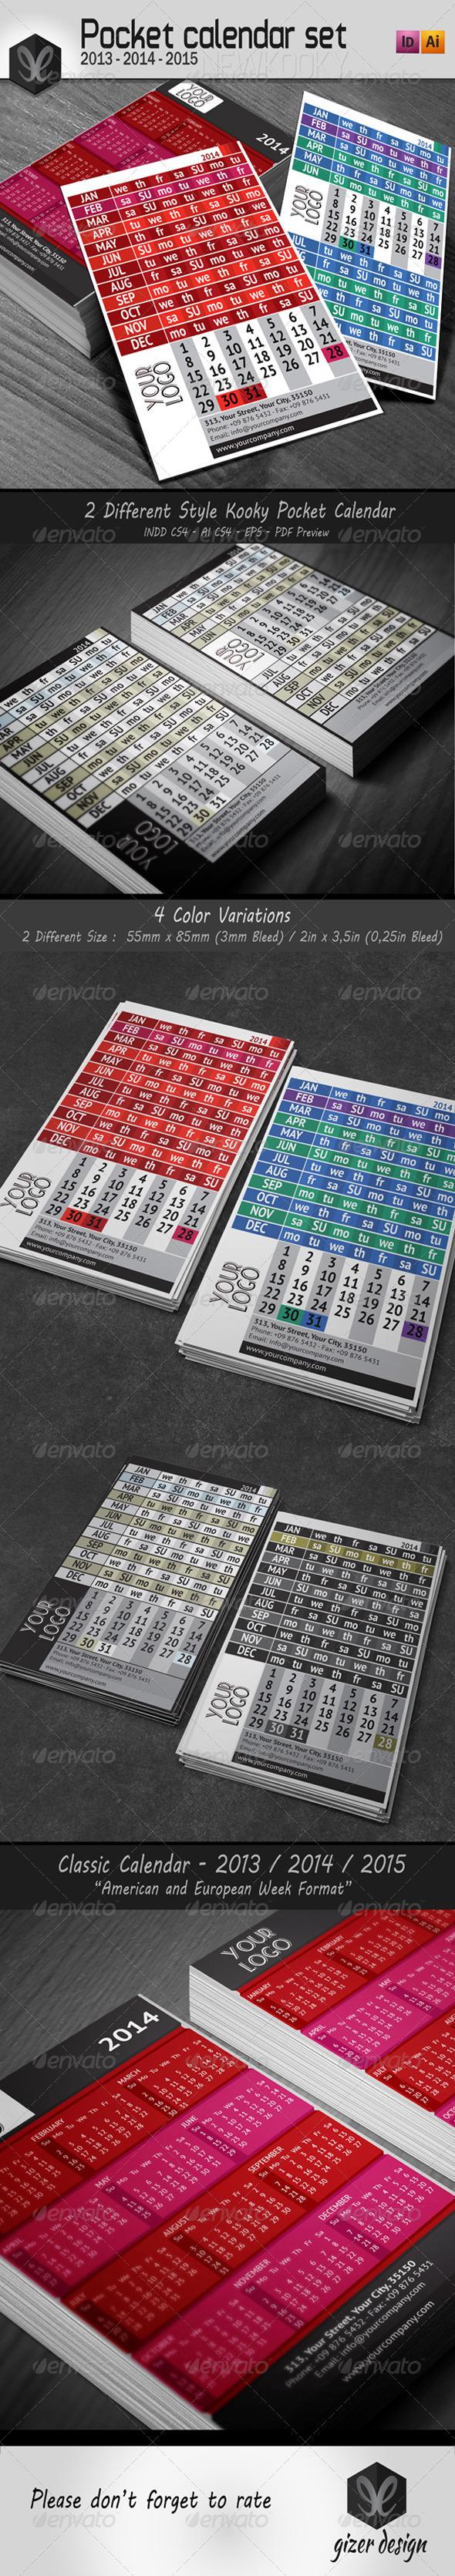 Pocket Calendar 2014 - 2013 - 2015 Set / New Kooky - Calendars Stationery